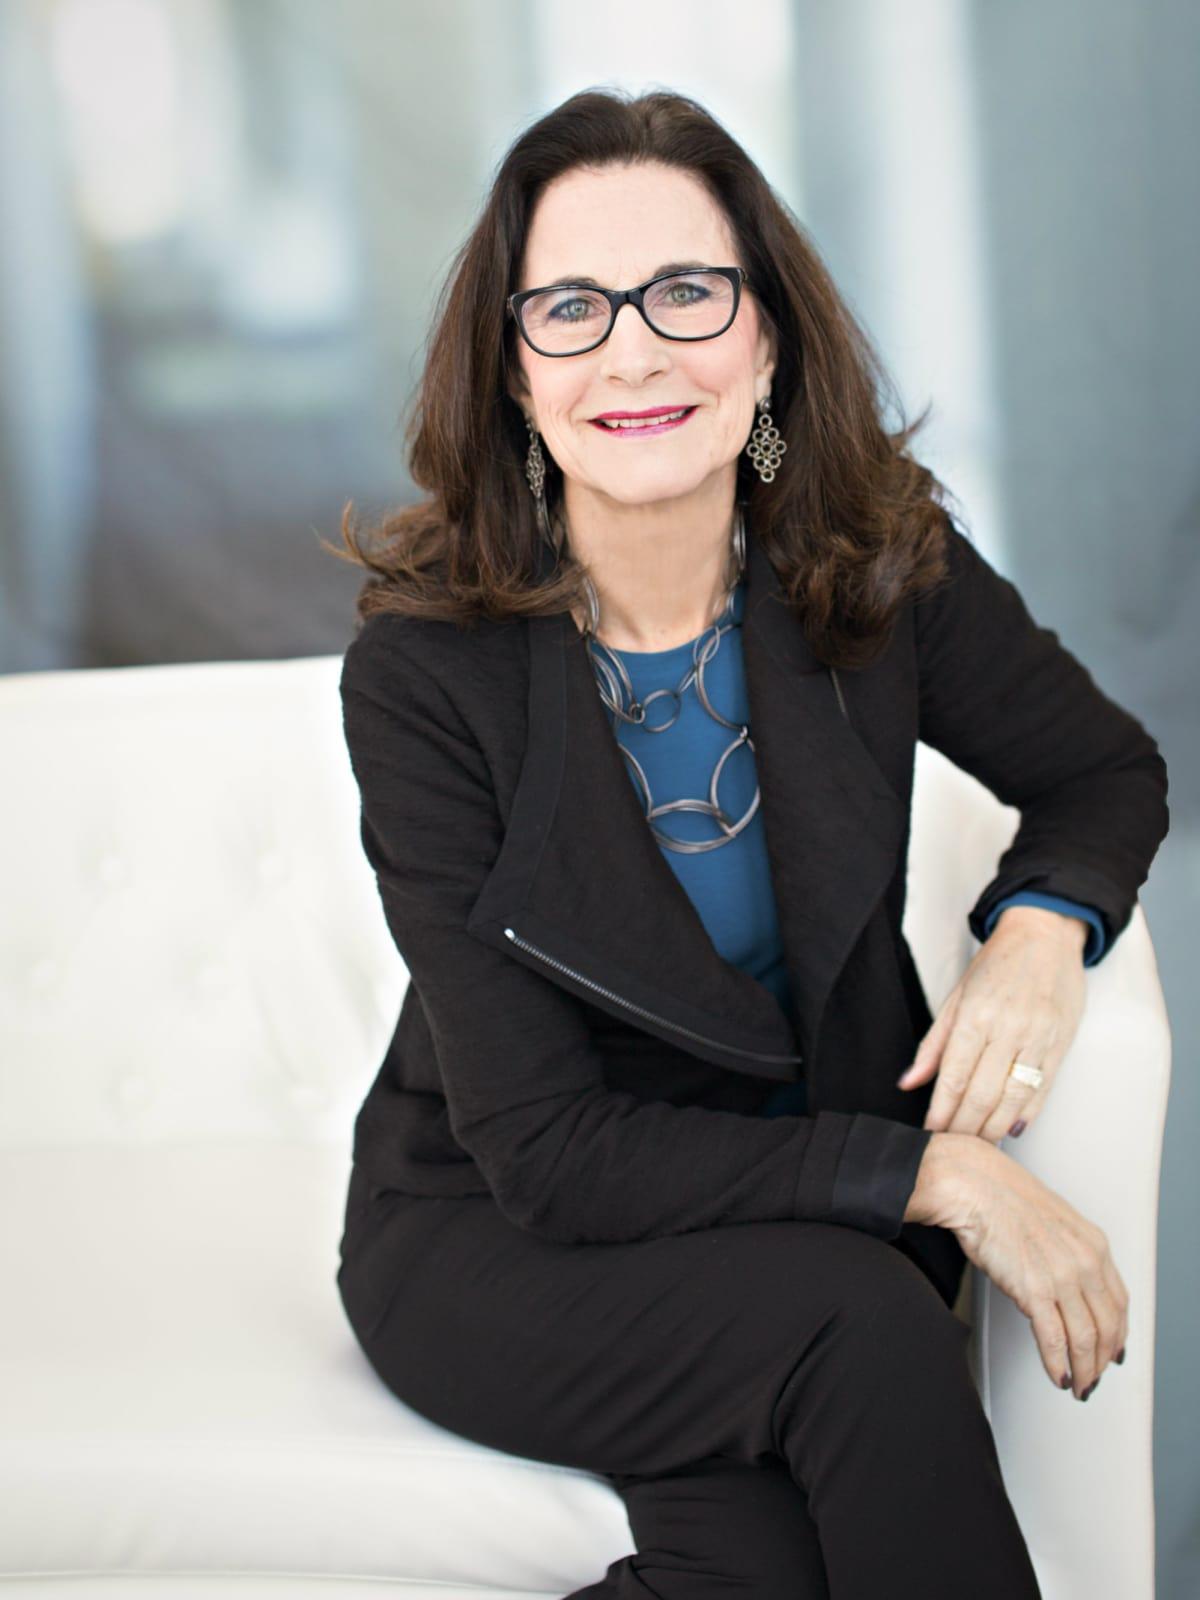 Realtor Susan Avant